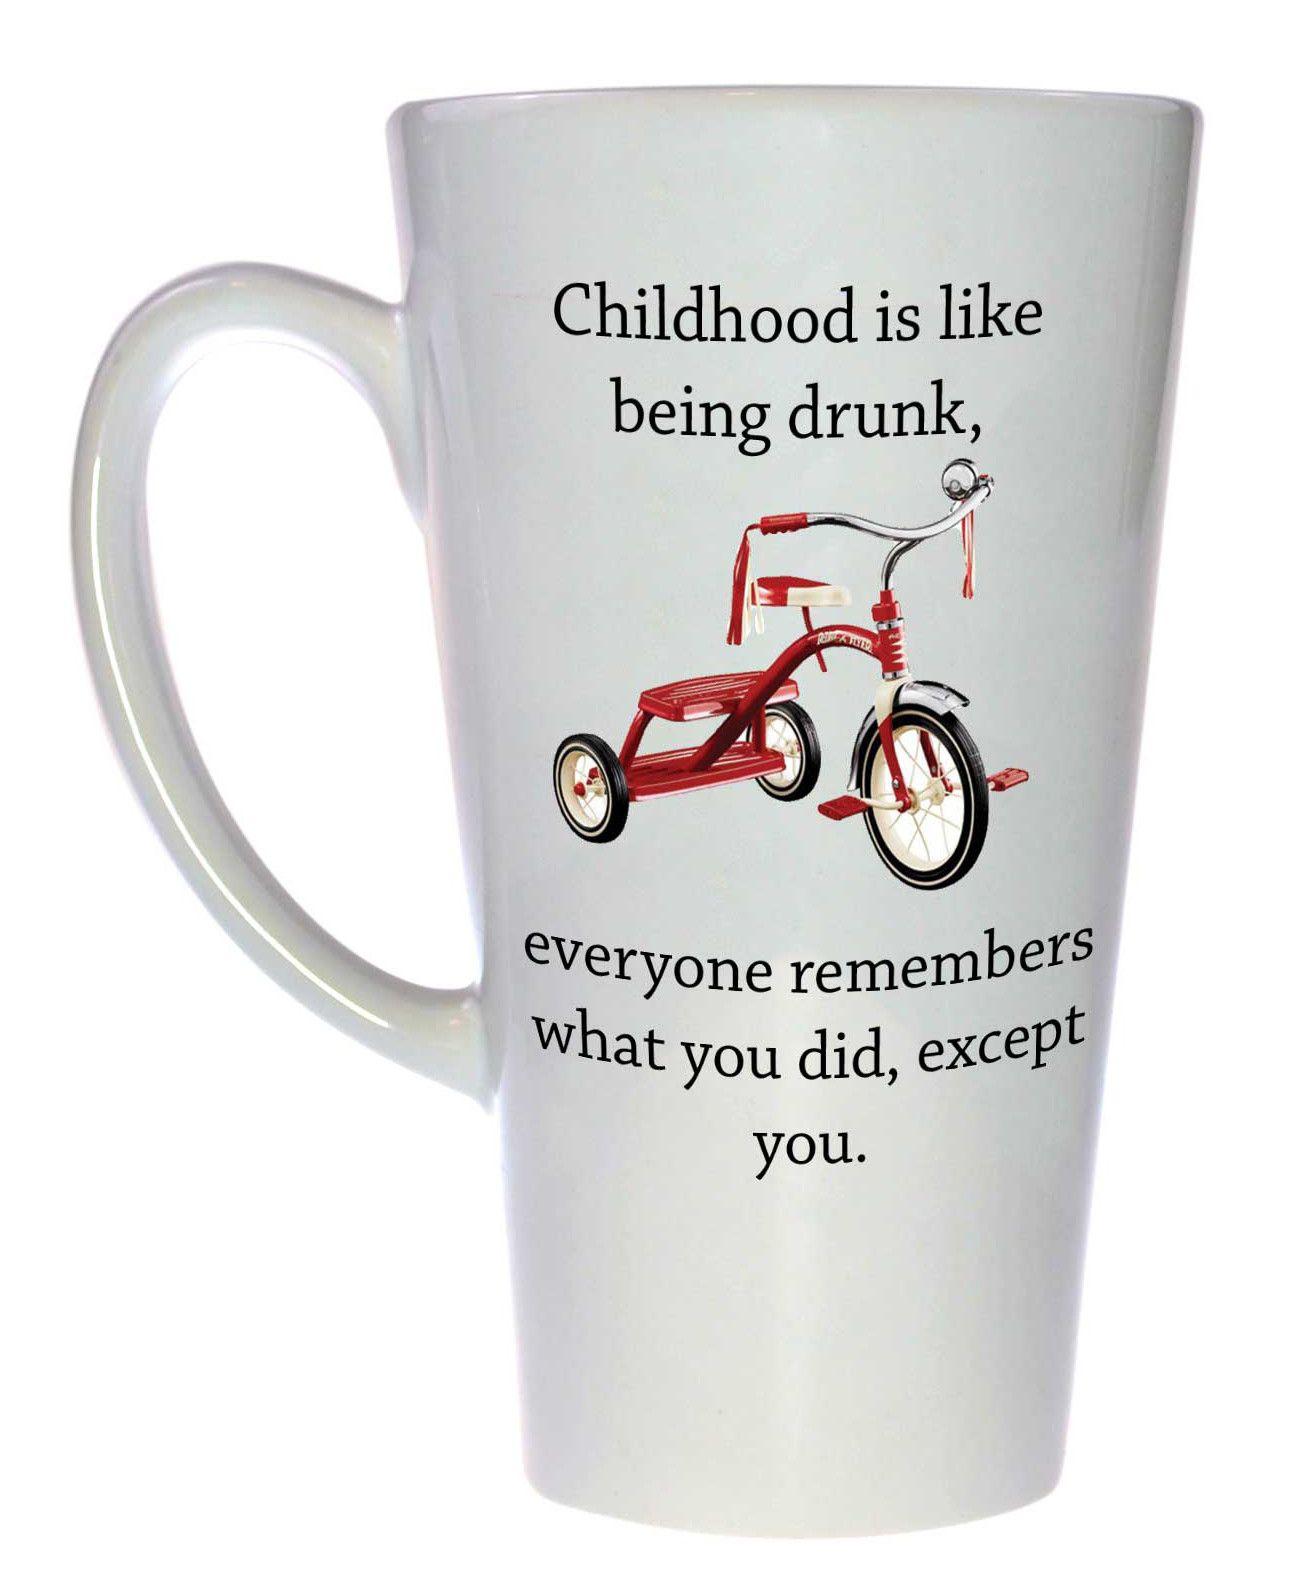 Drunk Childhood Coffee or Tea mug, Latte Size